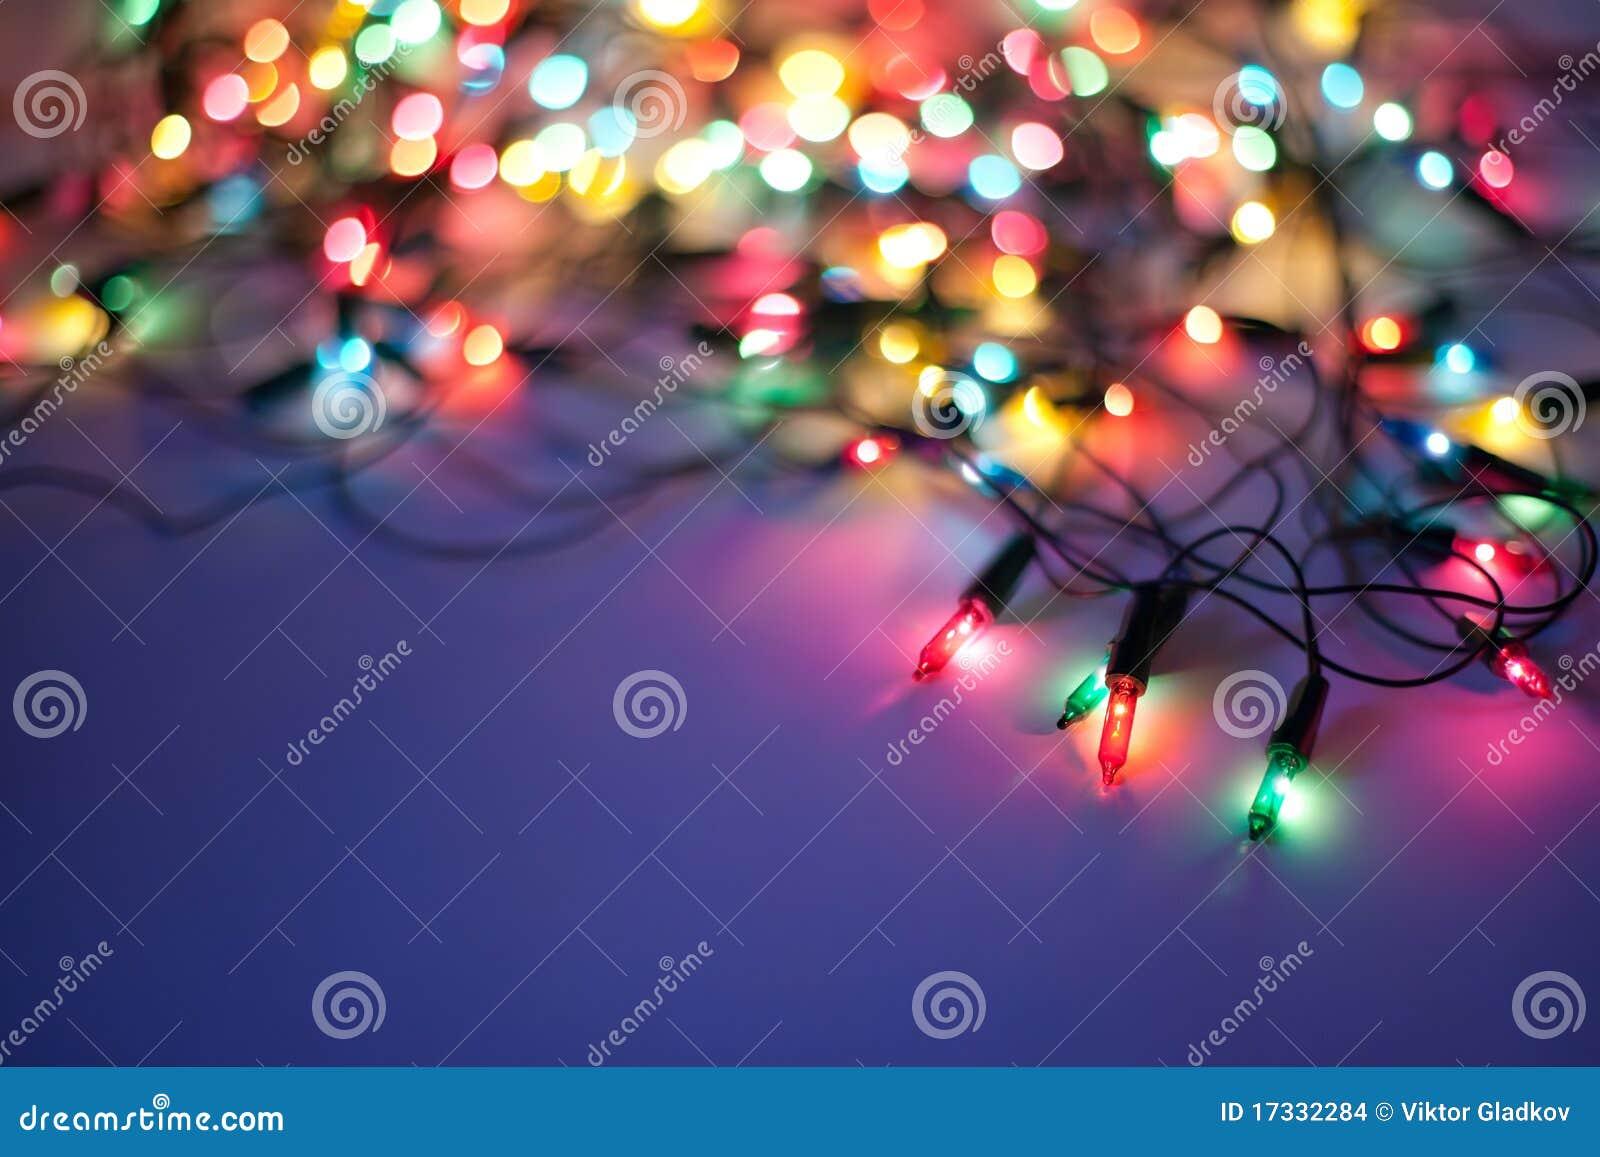 Christmas lights on dark blue background